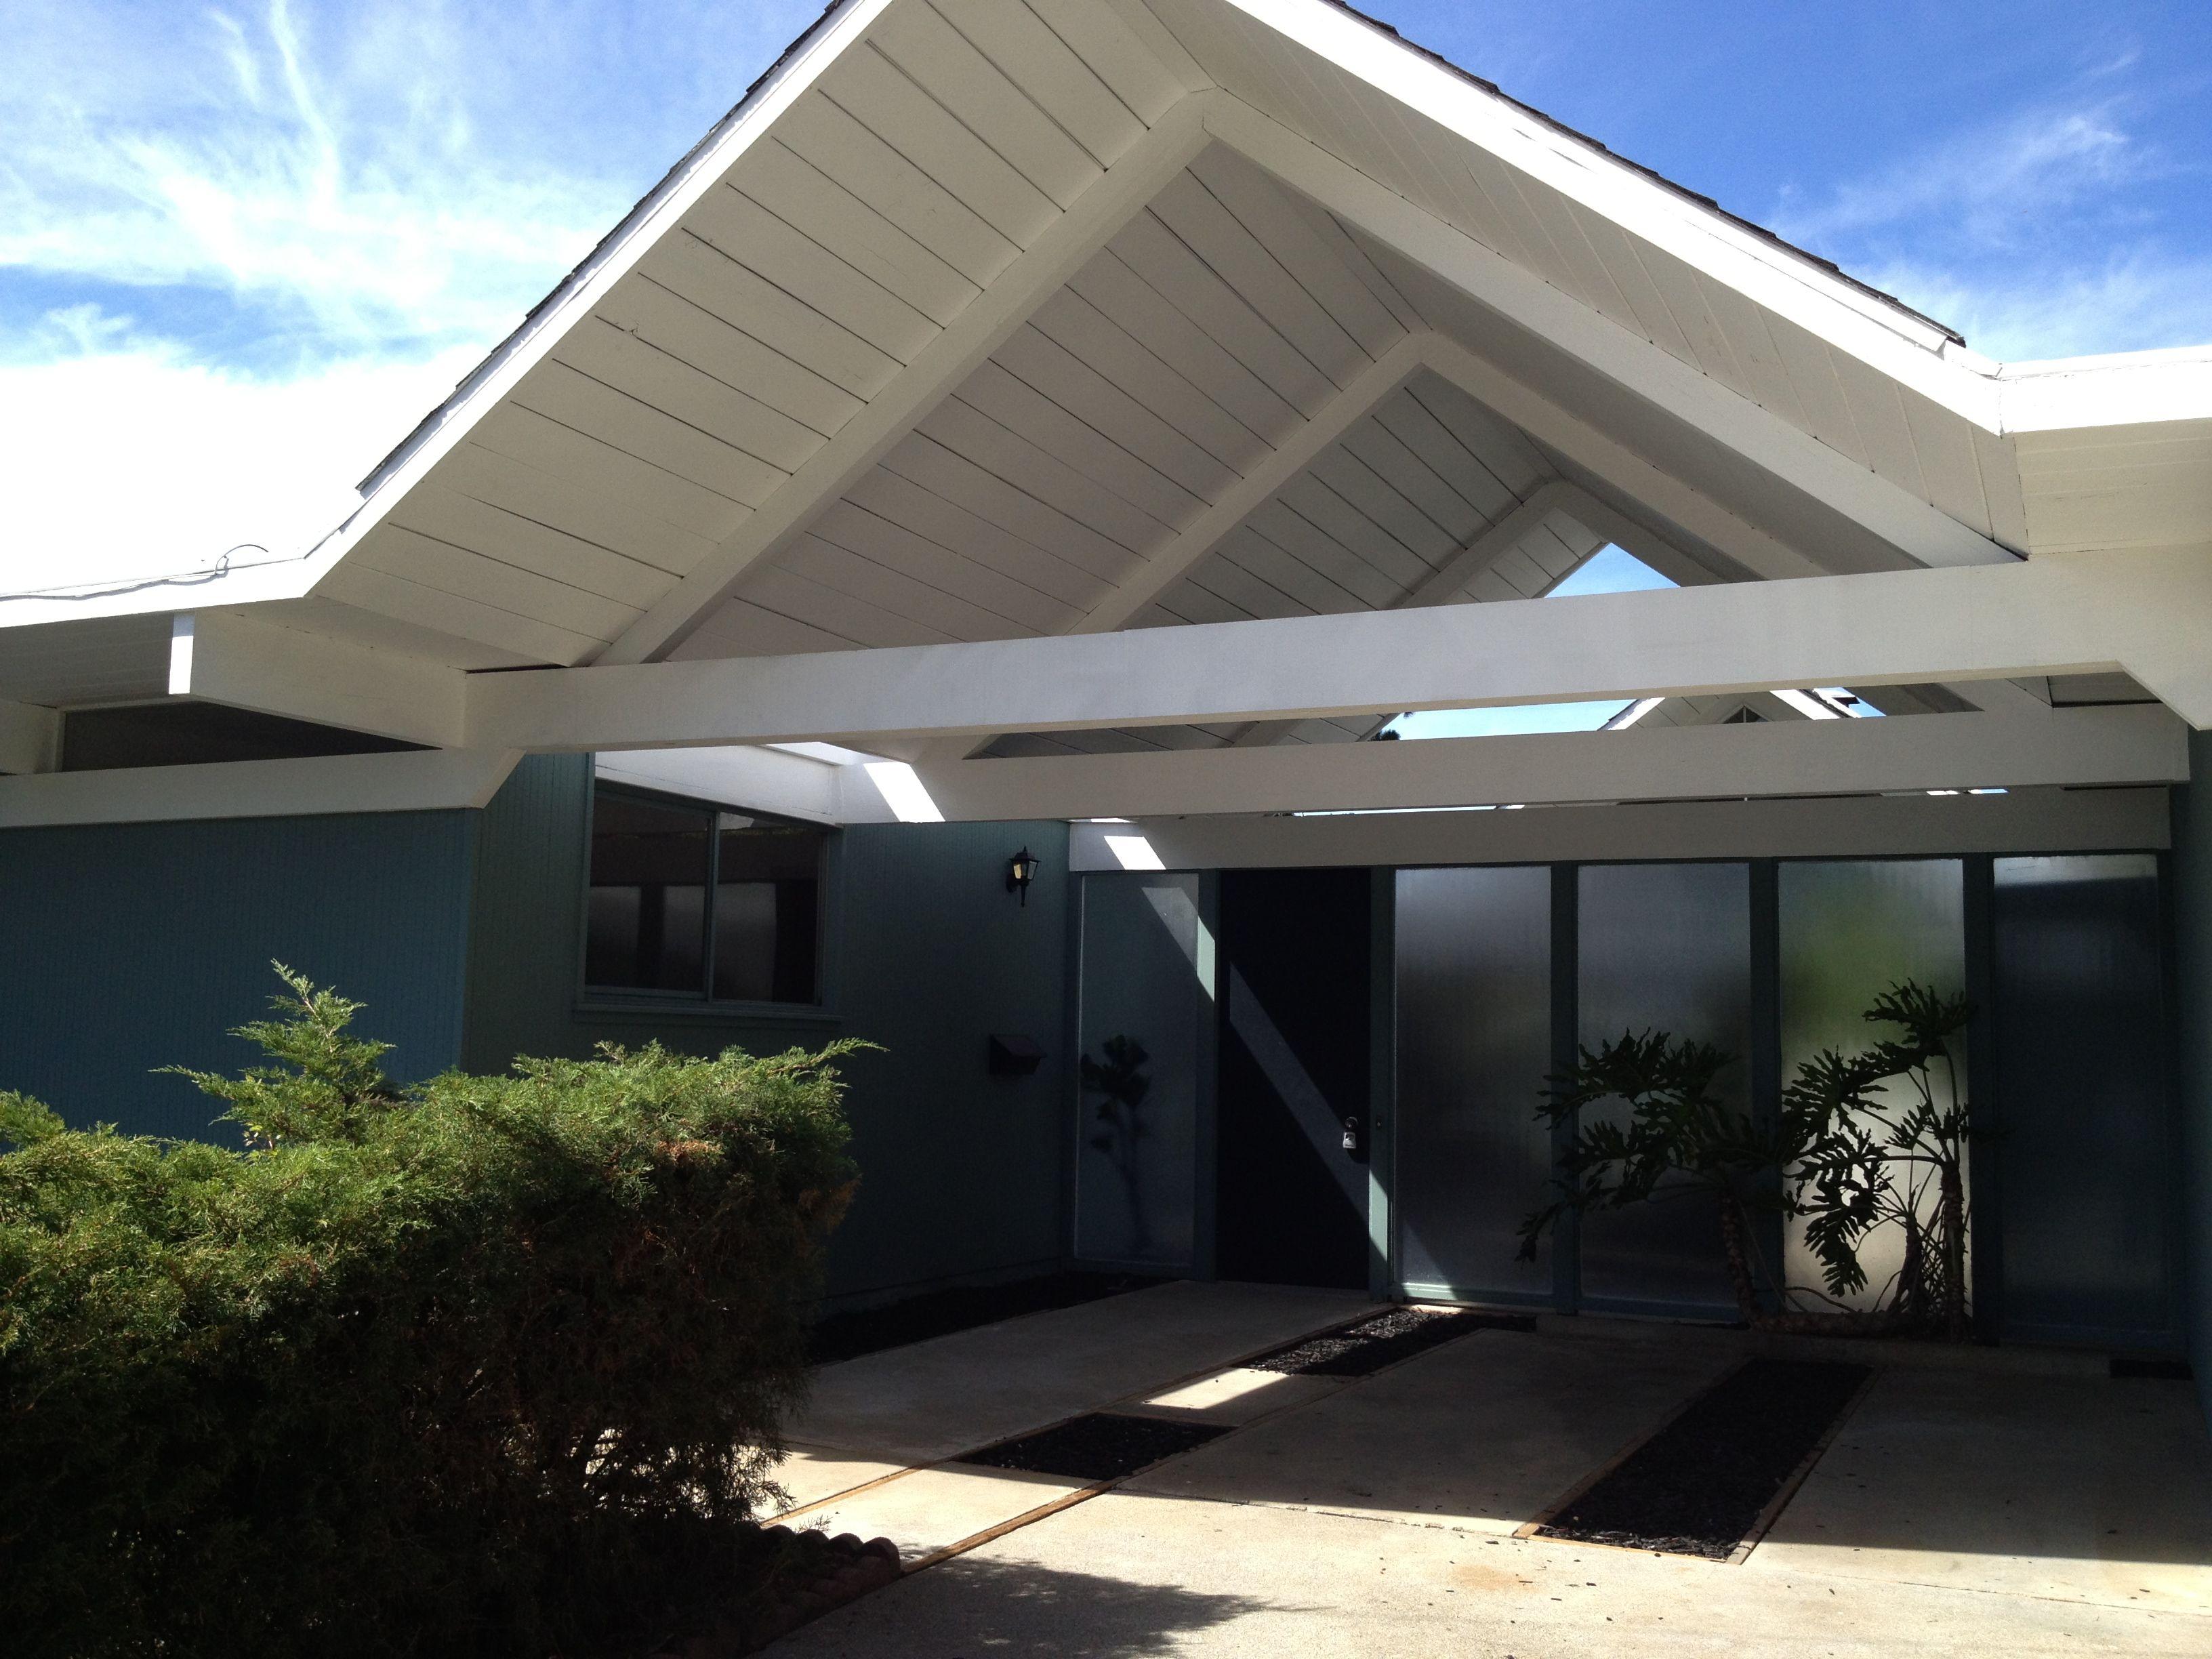 Eichler home eichler walnut creek east bay modern ken for Eichler homes for sale bay area